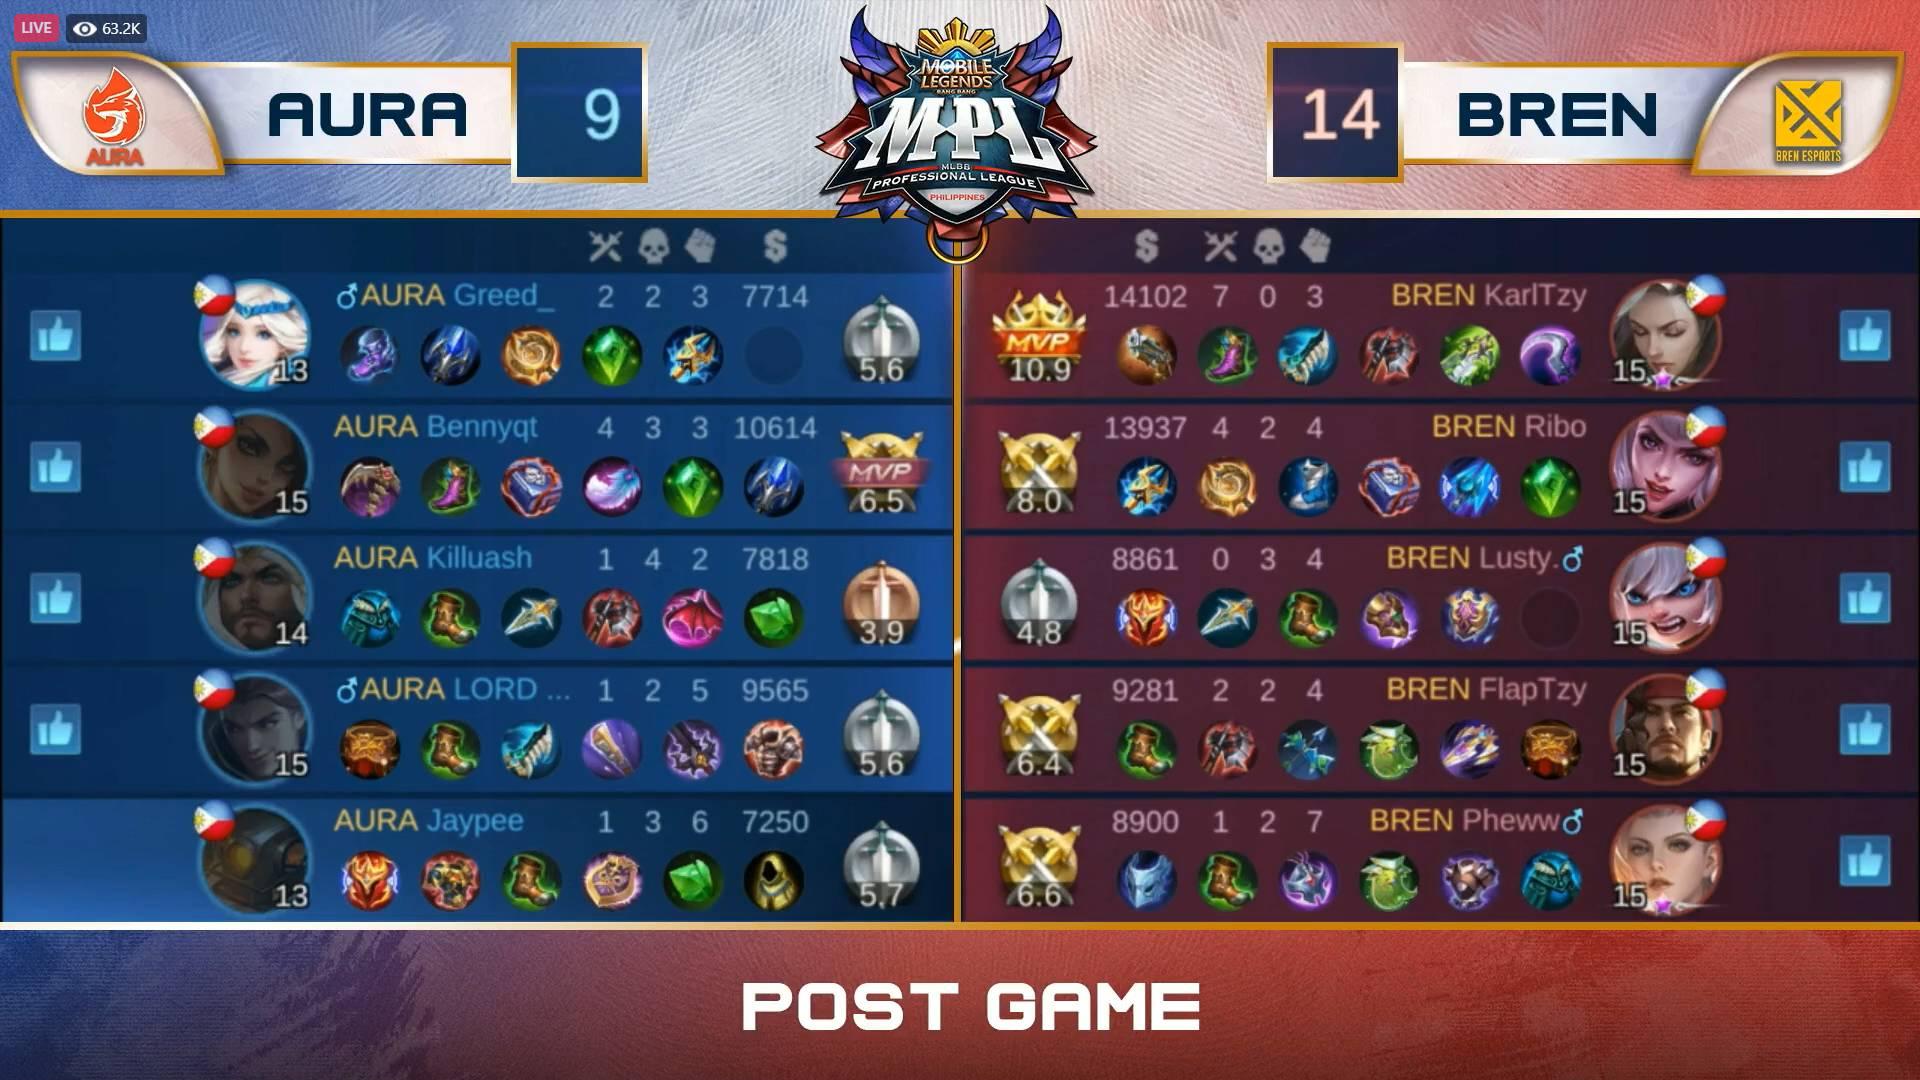 MPL-PH-7-AURA-def-BREN-Game-1 Aura PH continues BREN's woes in MPL-PH 7 ESports Mobile Legends MPL-PH News  - philippine sports news